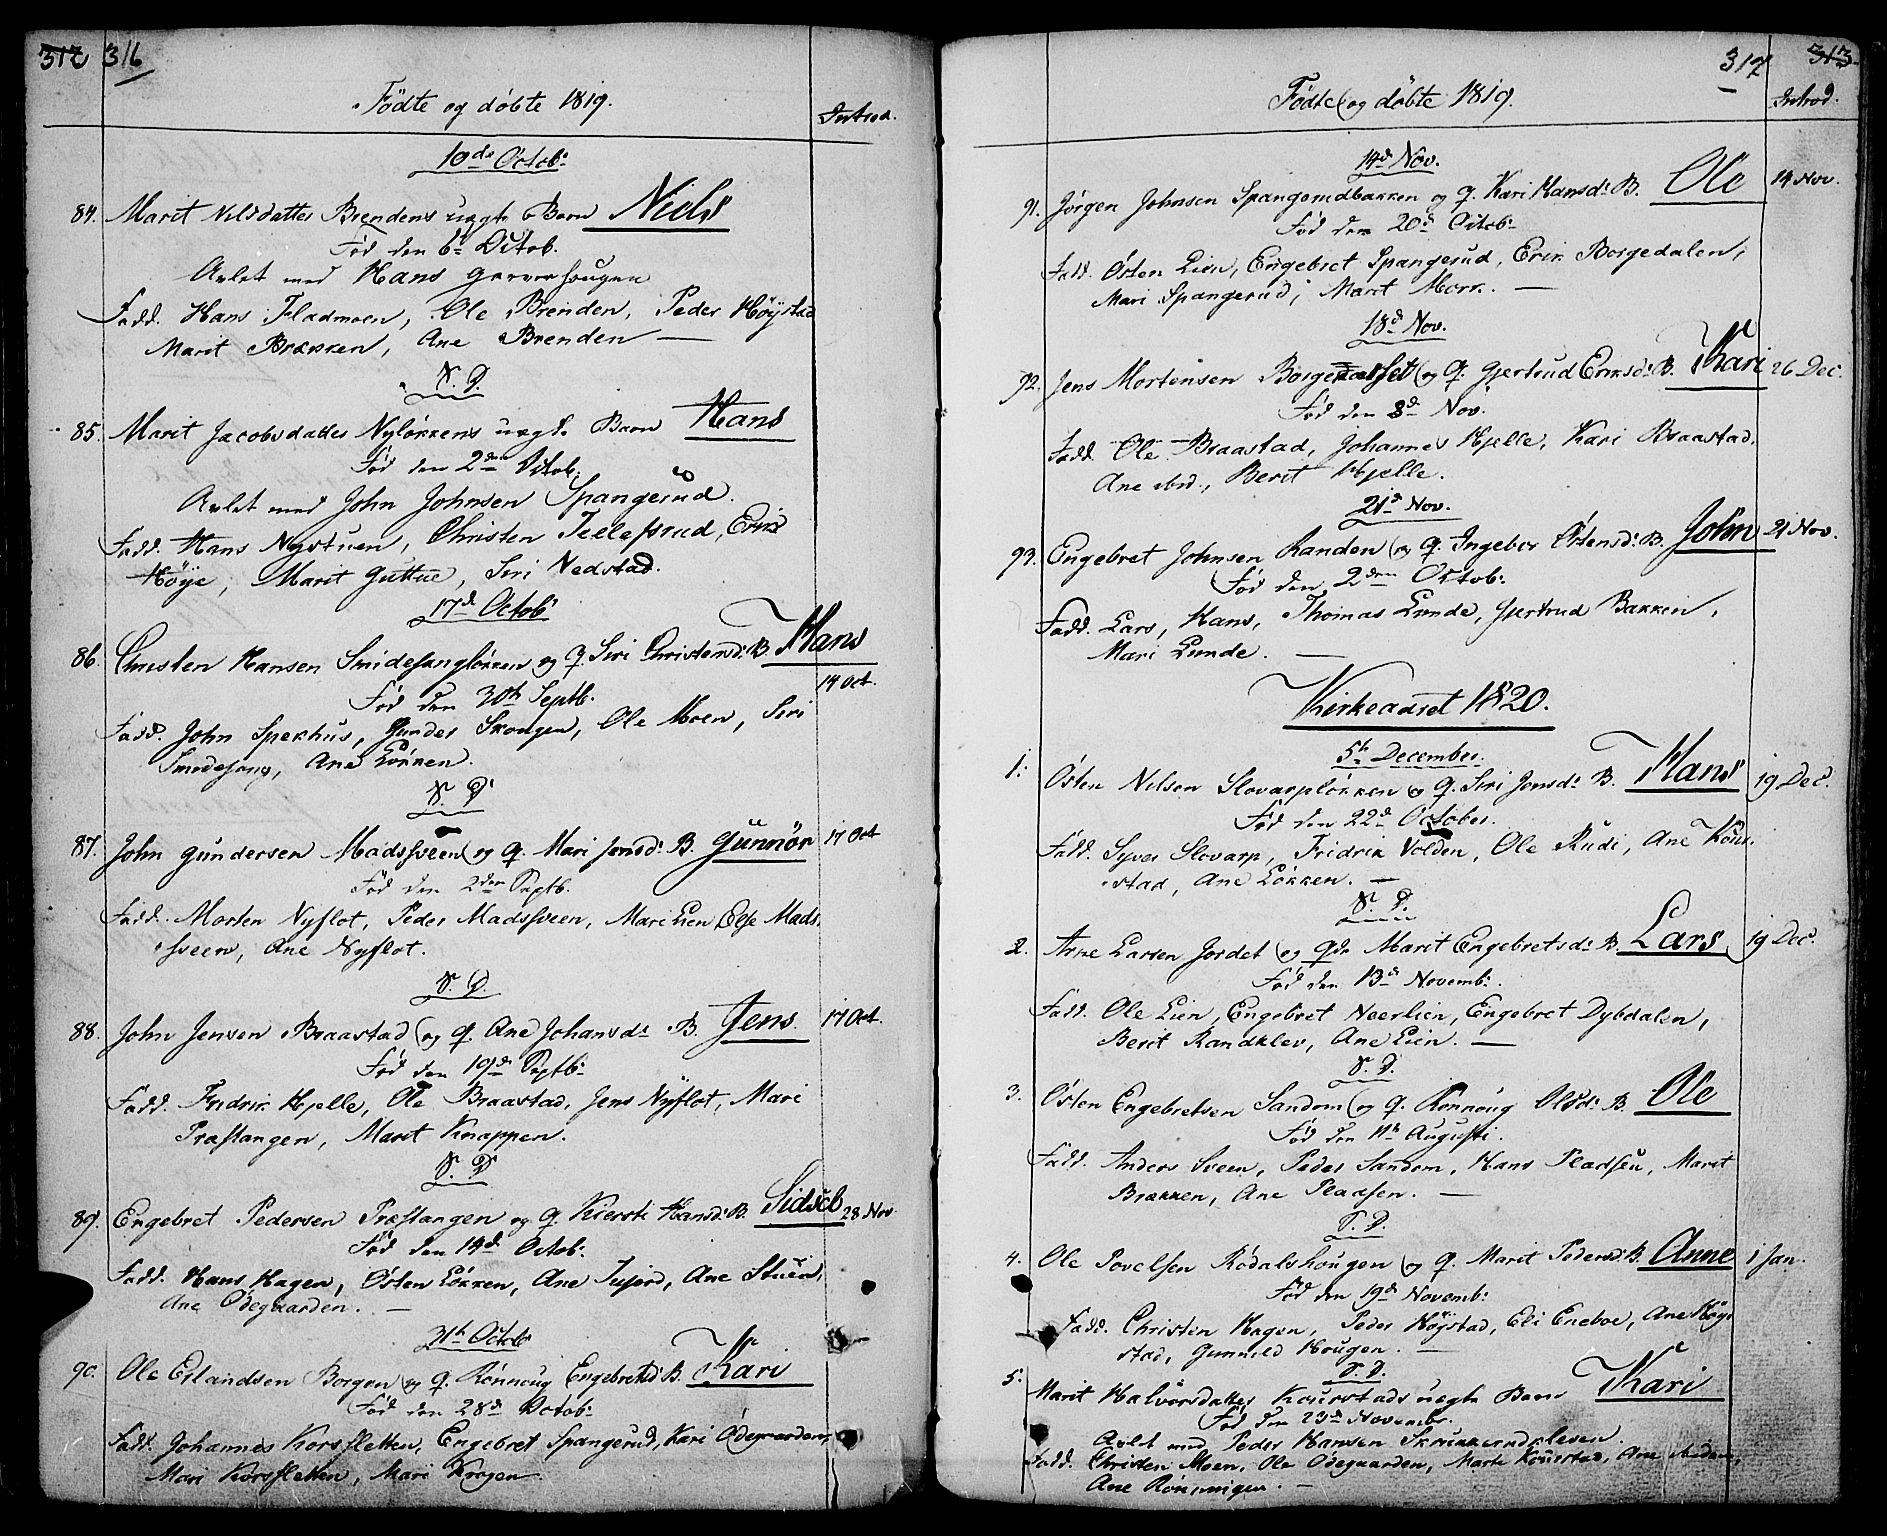 SAH, Ringebu prestekontor, Ministerialbok nr. 3, 1781-1820, s. 316-317